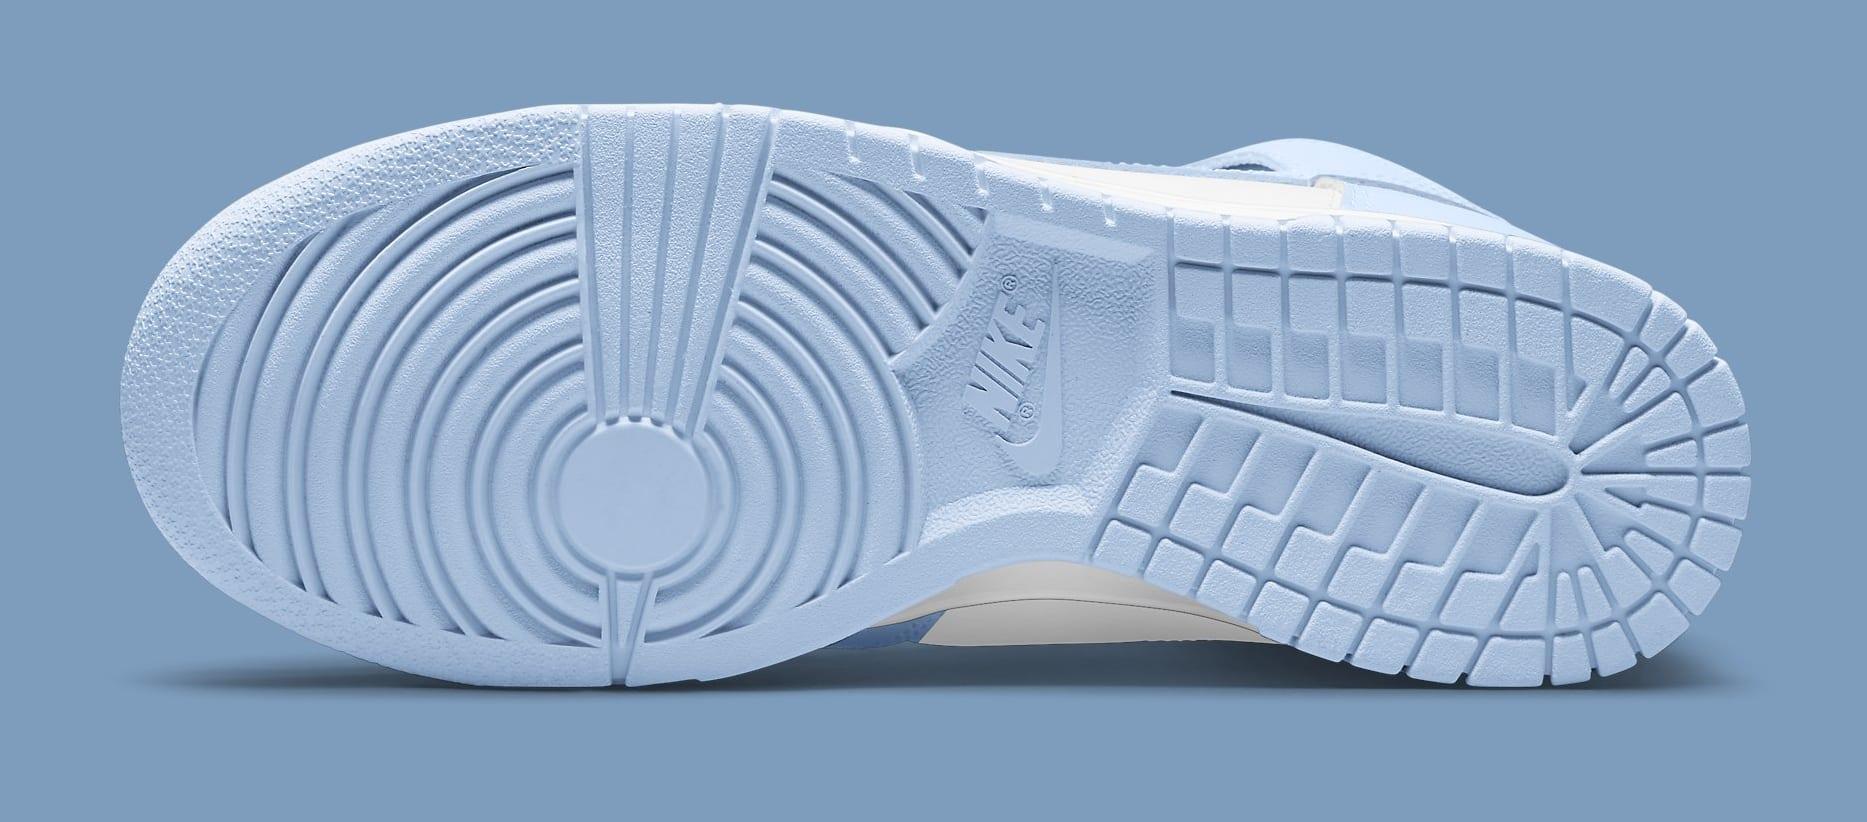 Nike Dunk High Women's 'Aluminum' DD1869-107 Outsole